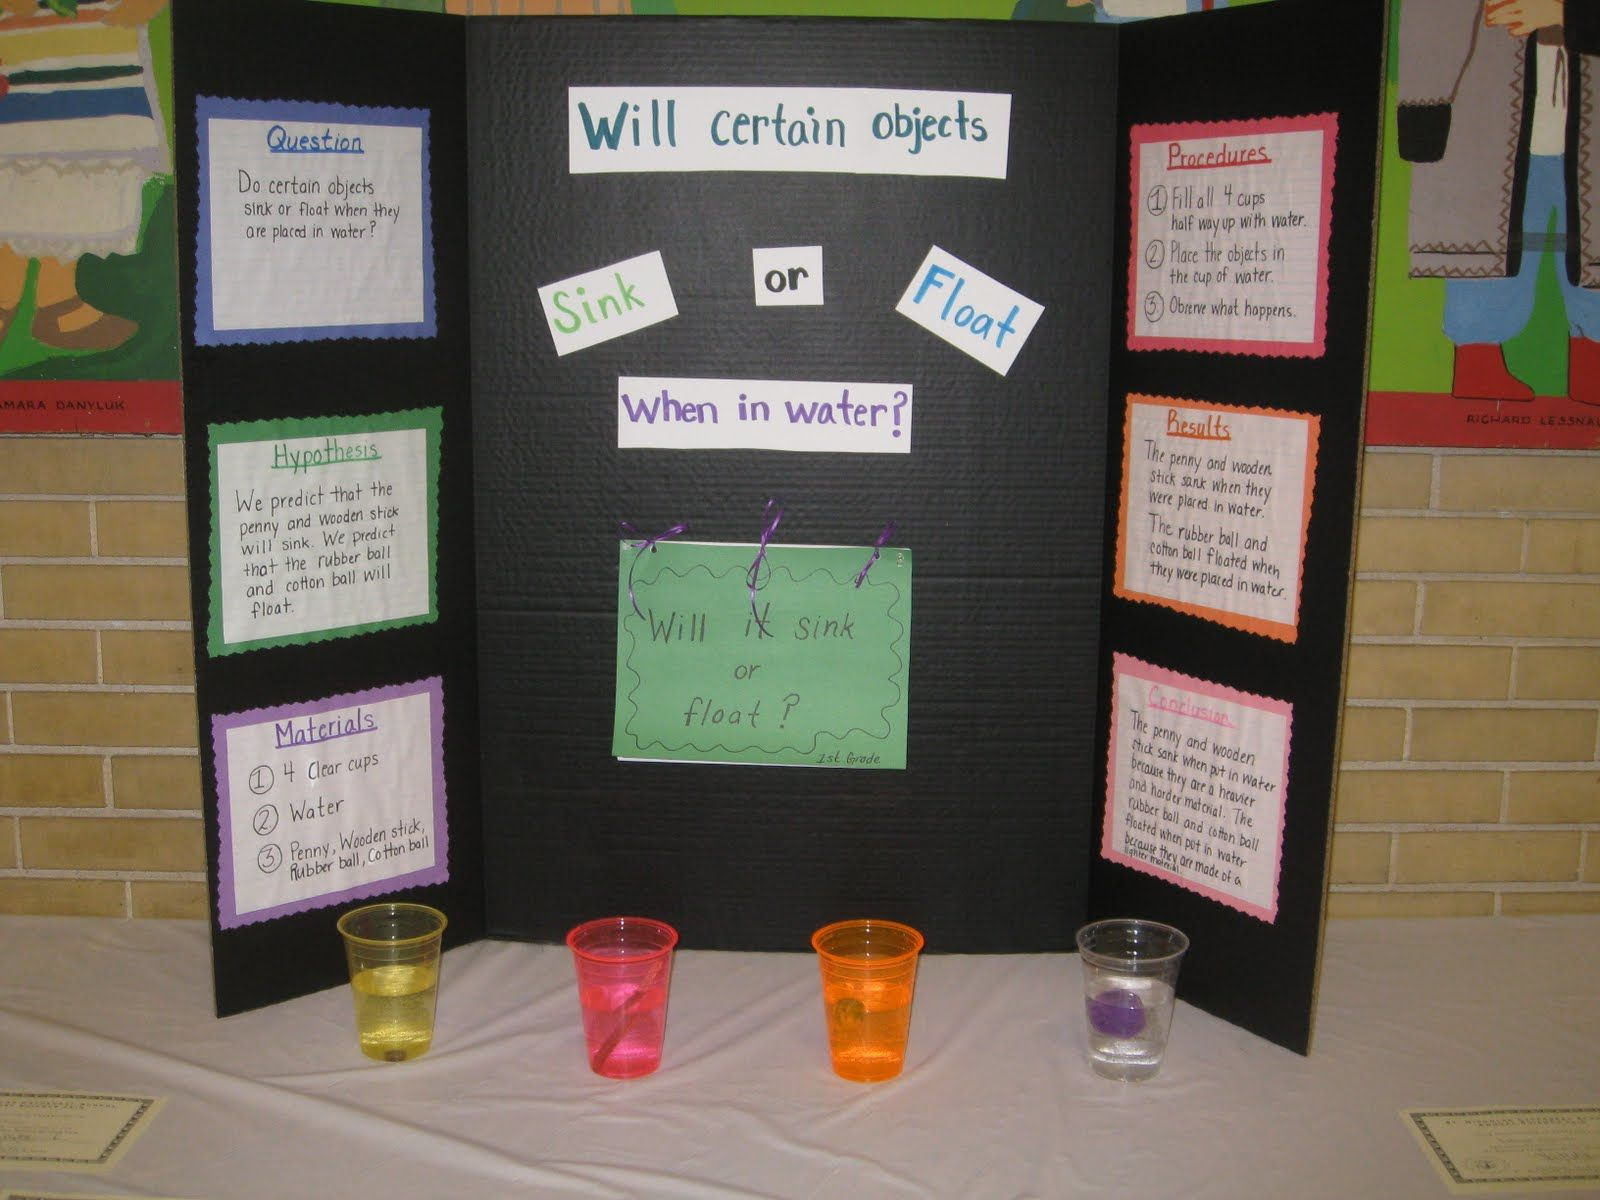 sink or float science fair project | Sink or Float? | Pinterest ...